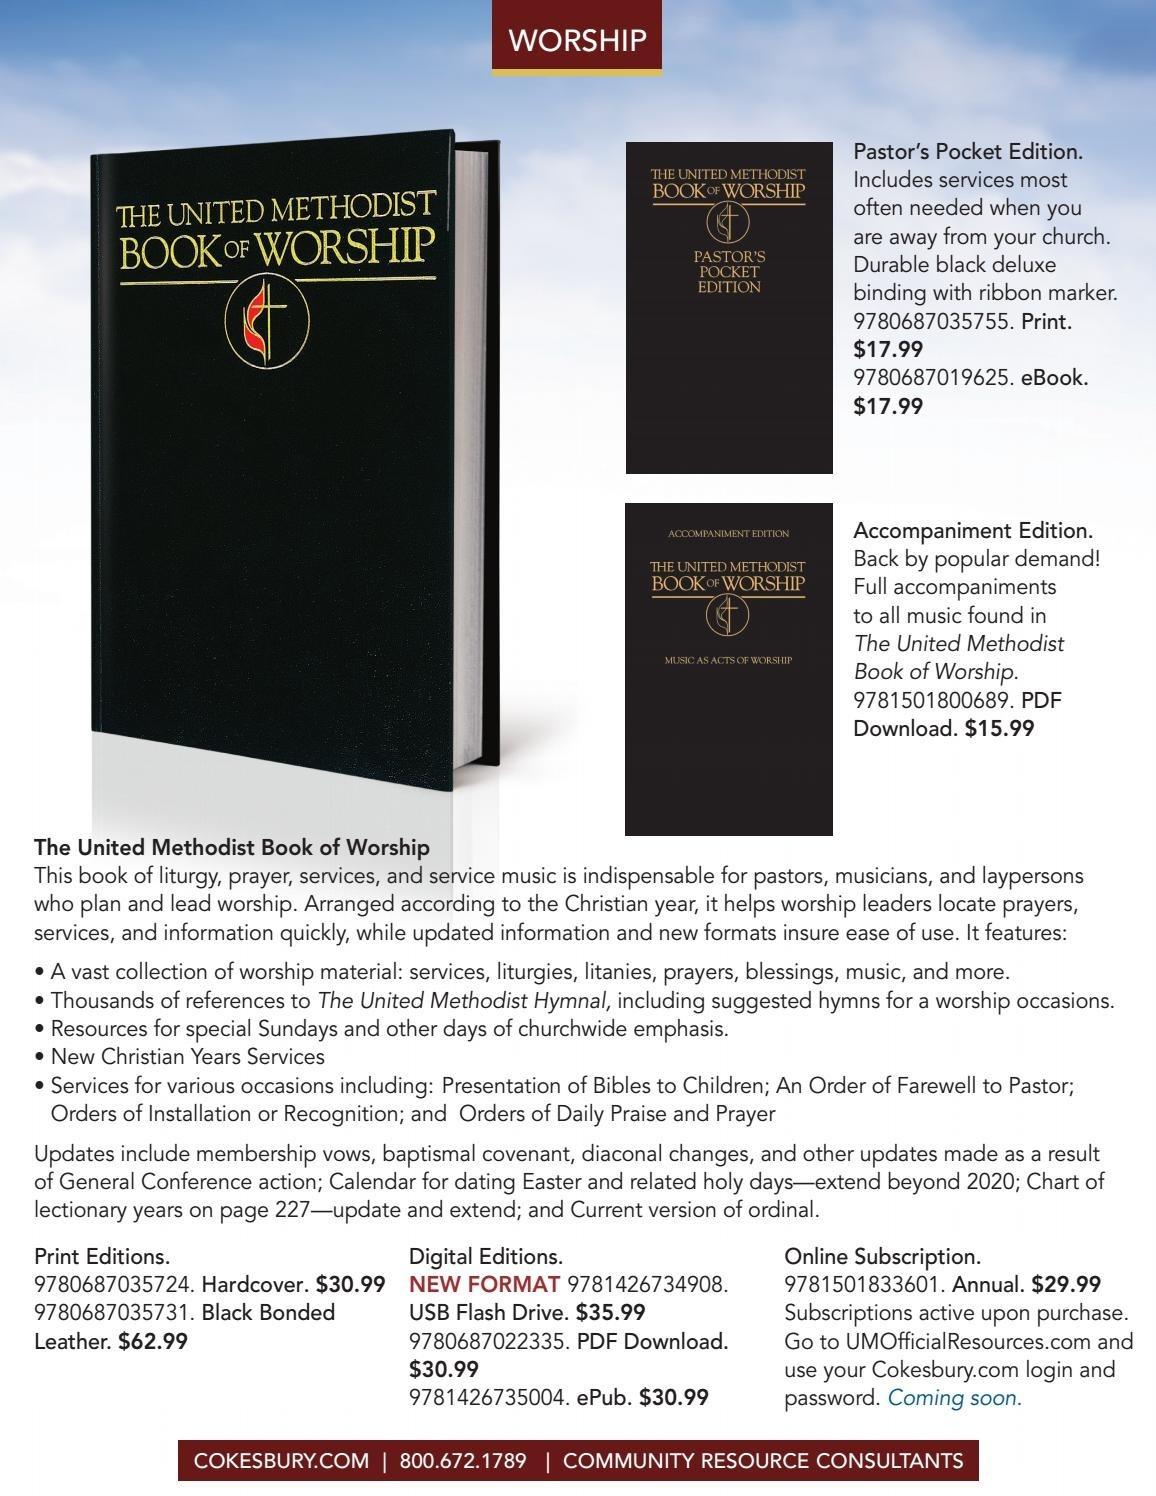 Methodist Lectionary Calendar 2020 - Template Calendar Design  Lent 2021 United Methodist